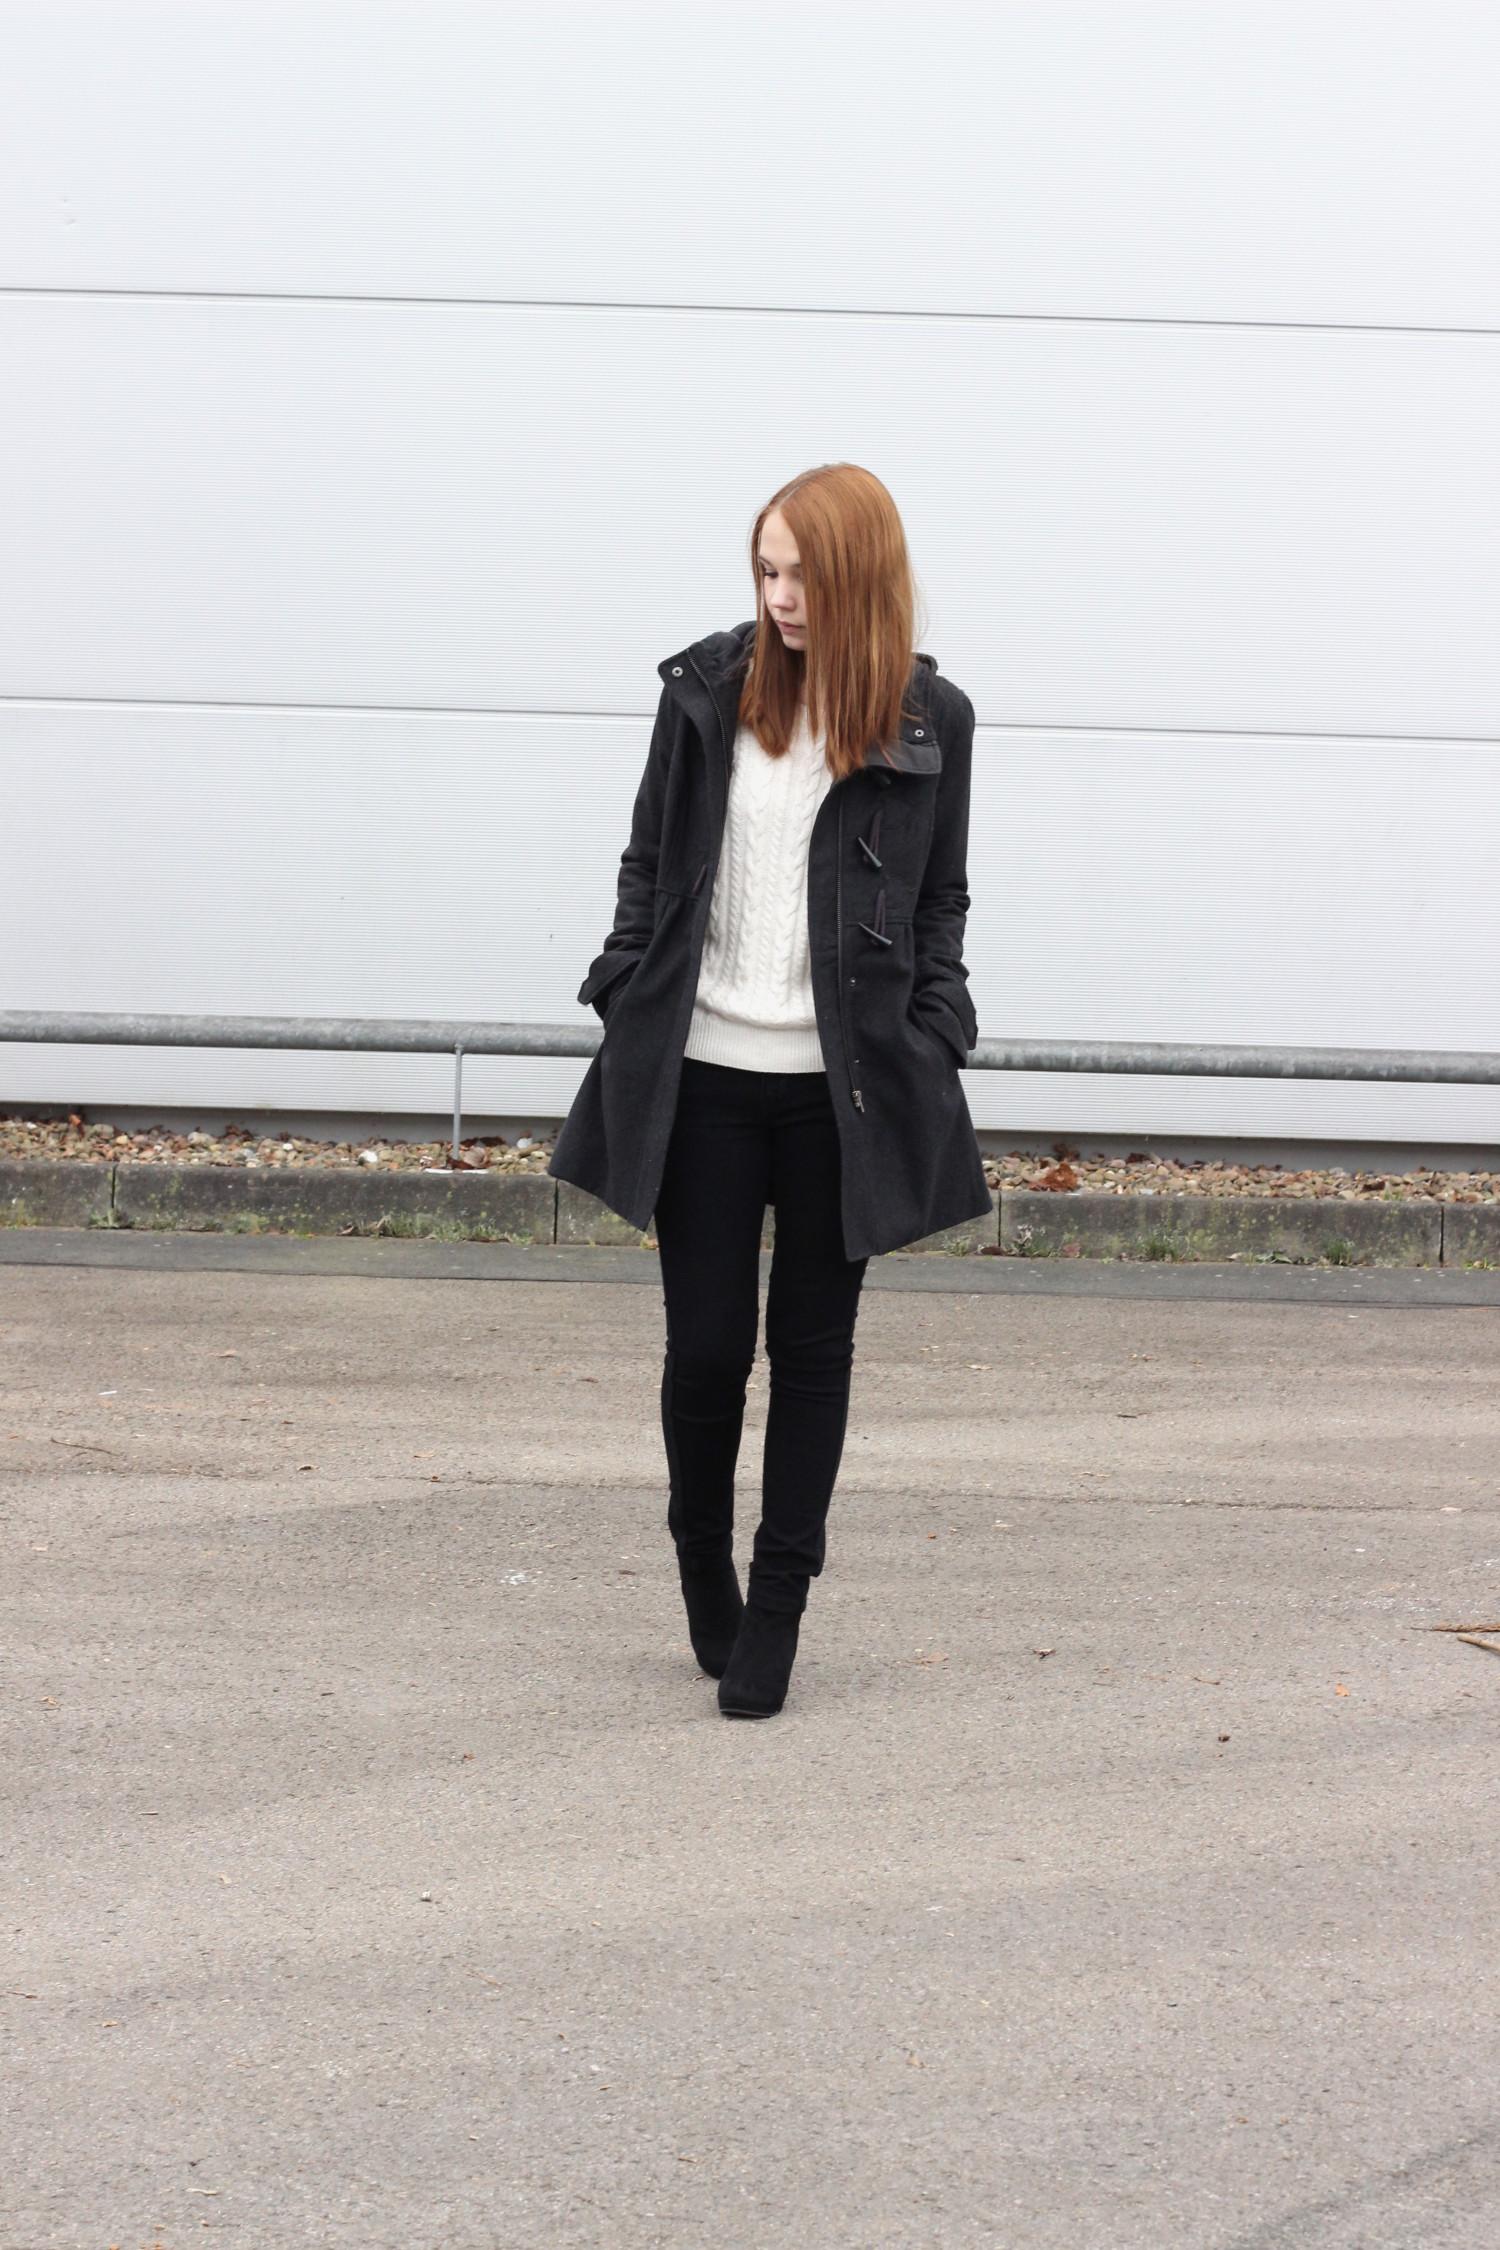 bezaubernde nana, fashionblog, germany, outfit, schwarzer mantel h&m, schwarze skinny jeans h&m, weißer strickpullover h&m, schwarze stiefeletten dolce vita